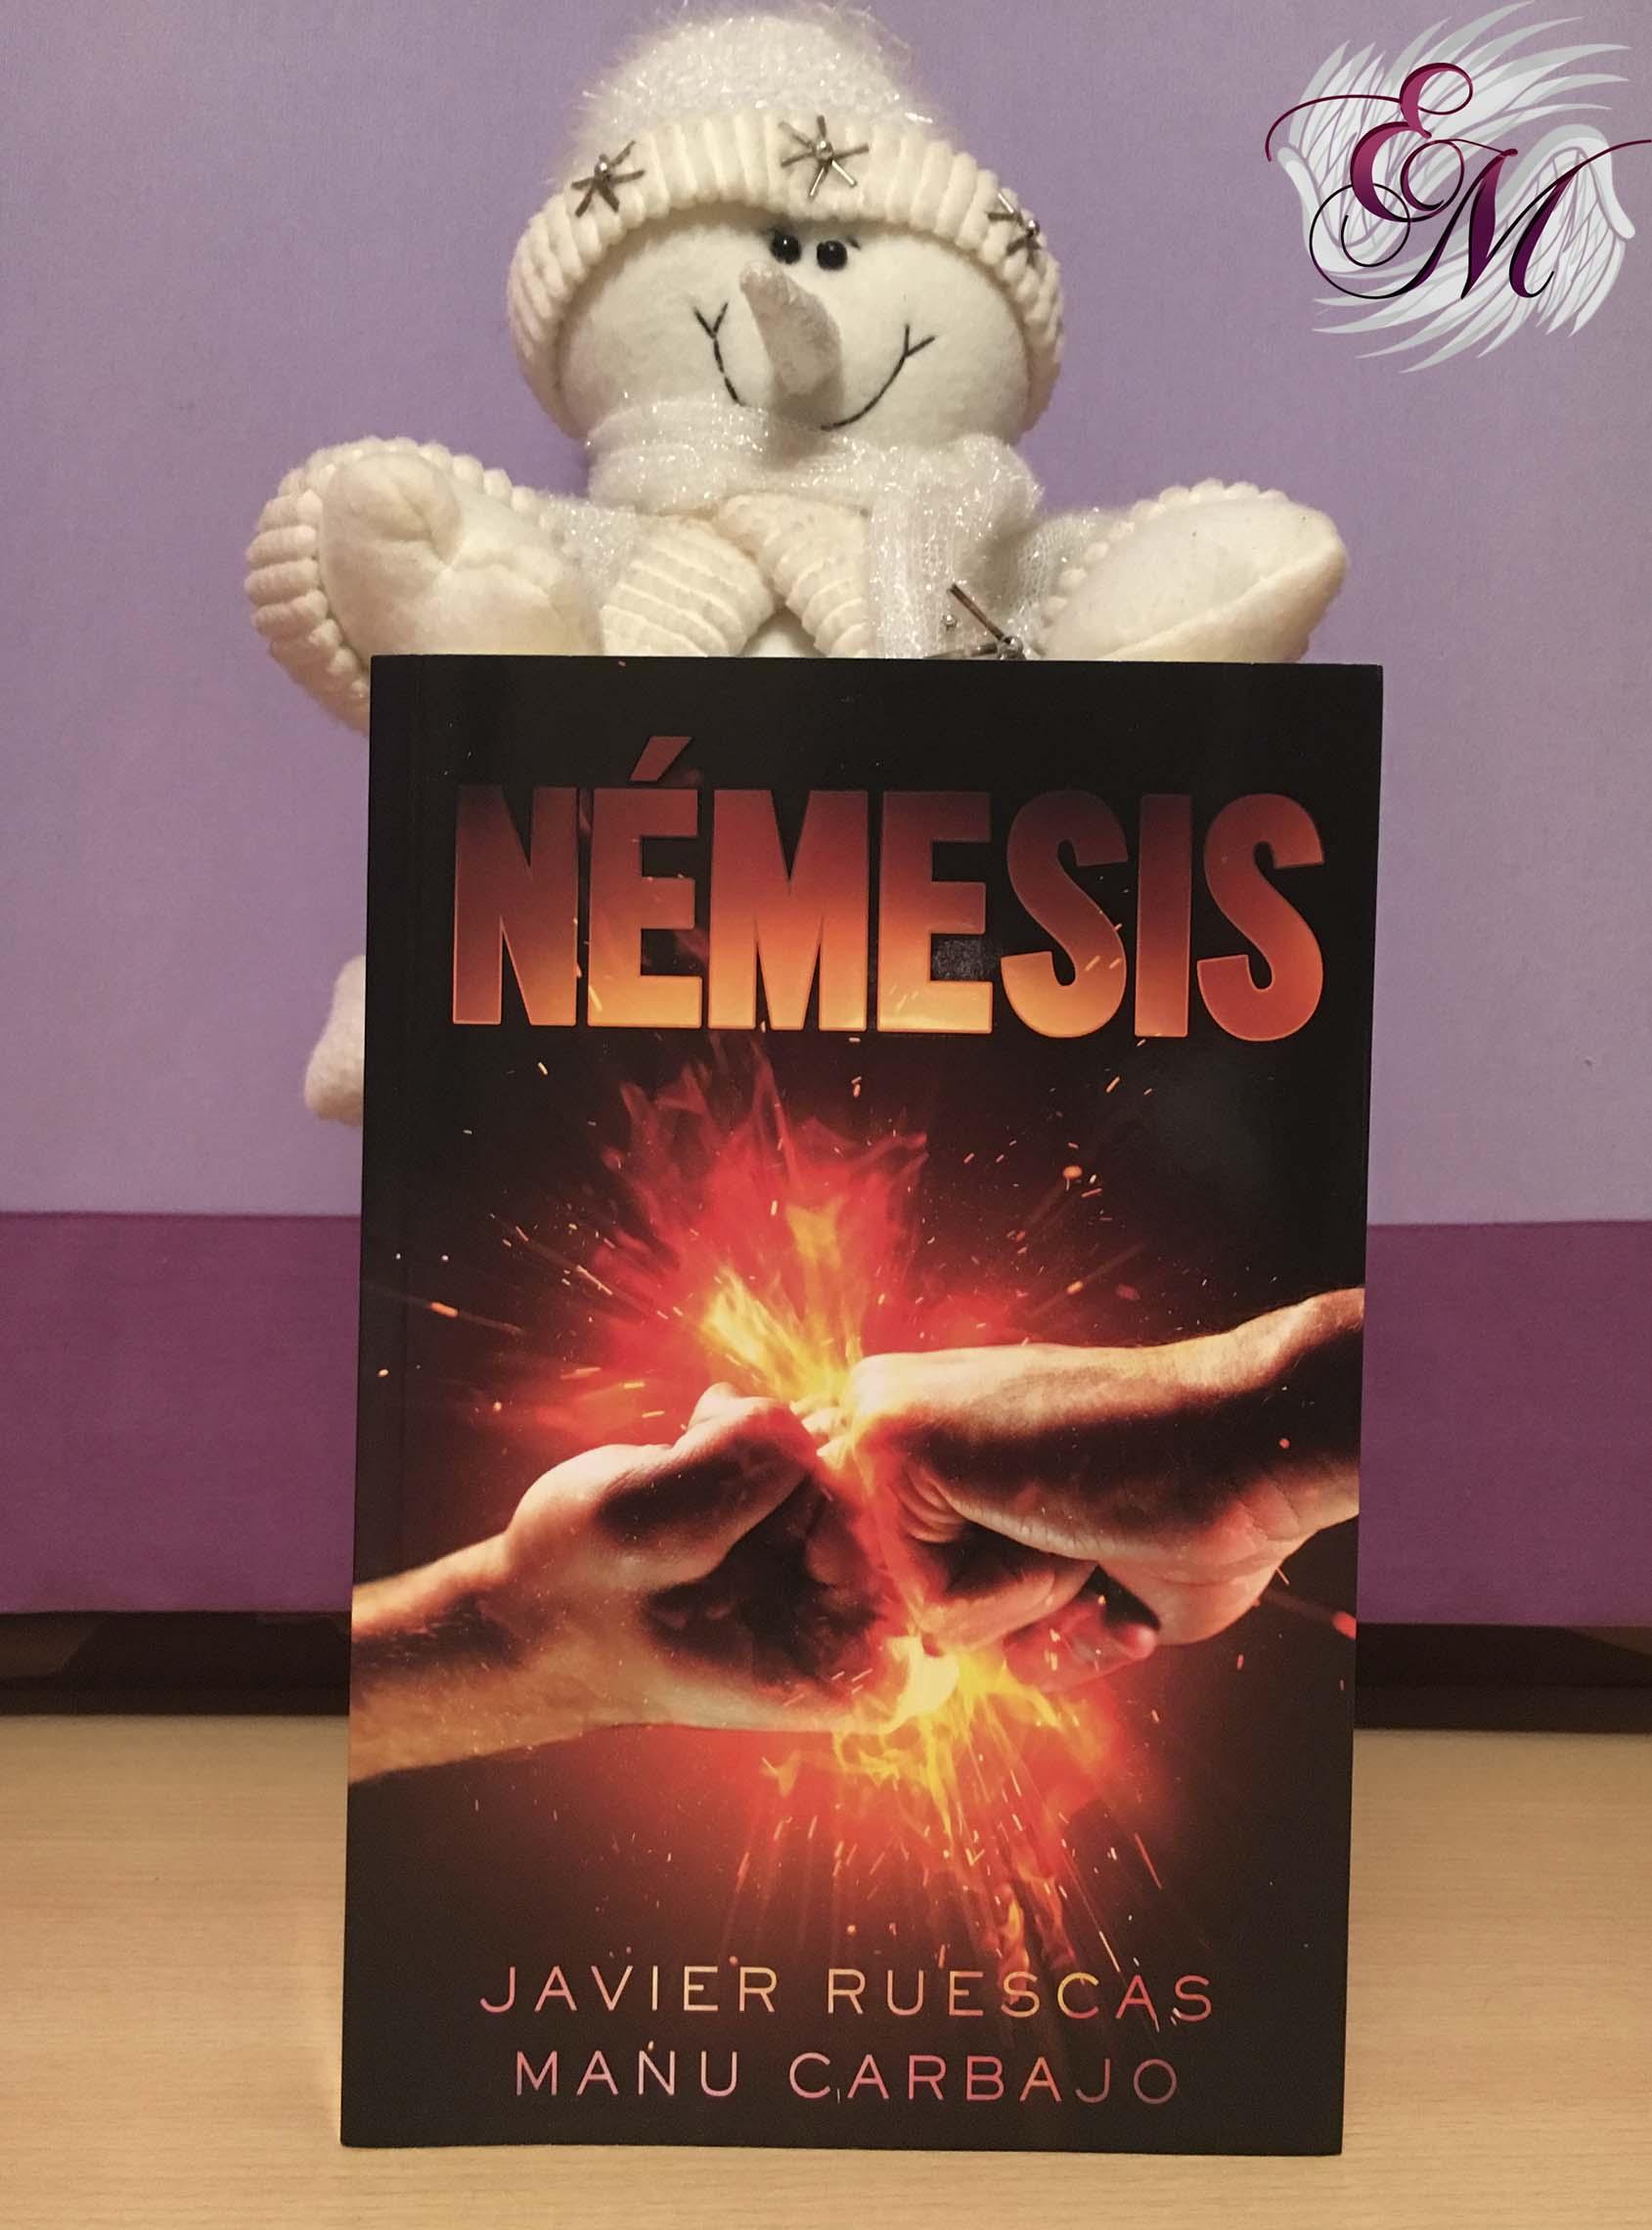 Némesis, Javier Ruescas y Manu Carbajo - Reseña